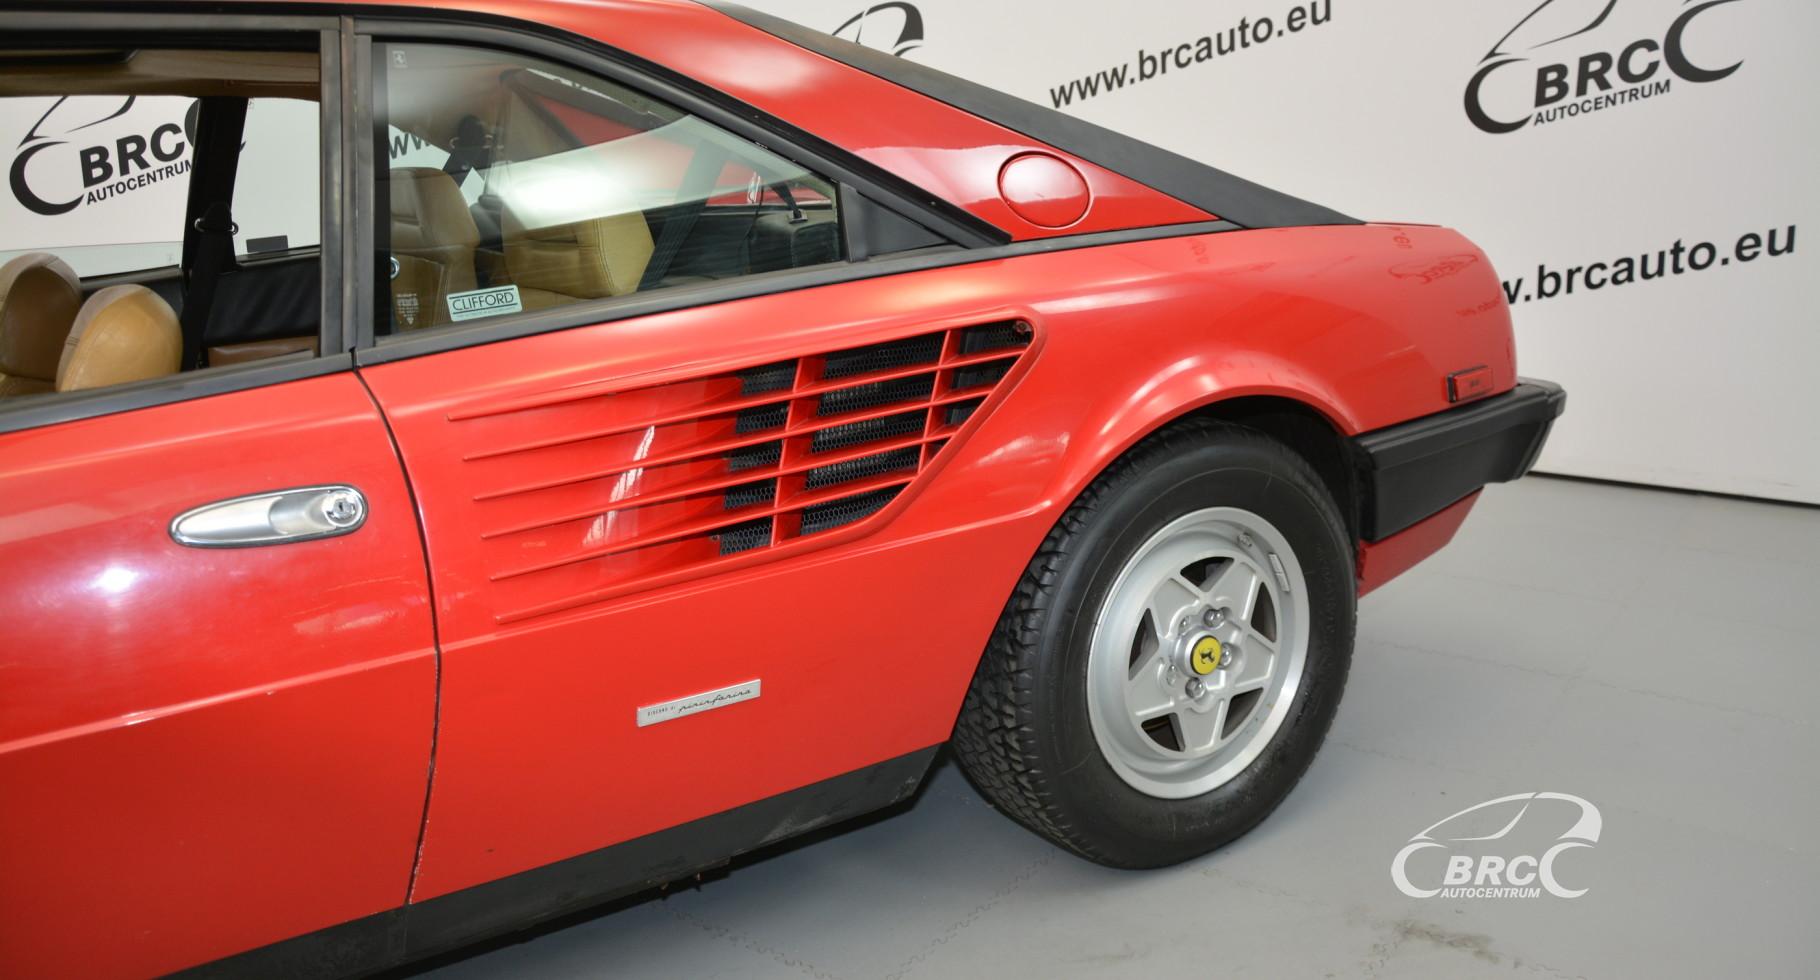 Ferrari Mondial 8 V8 Coupe ID 811771 BRC Autocentras